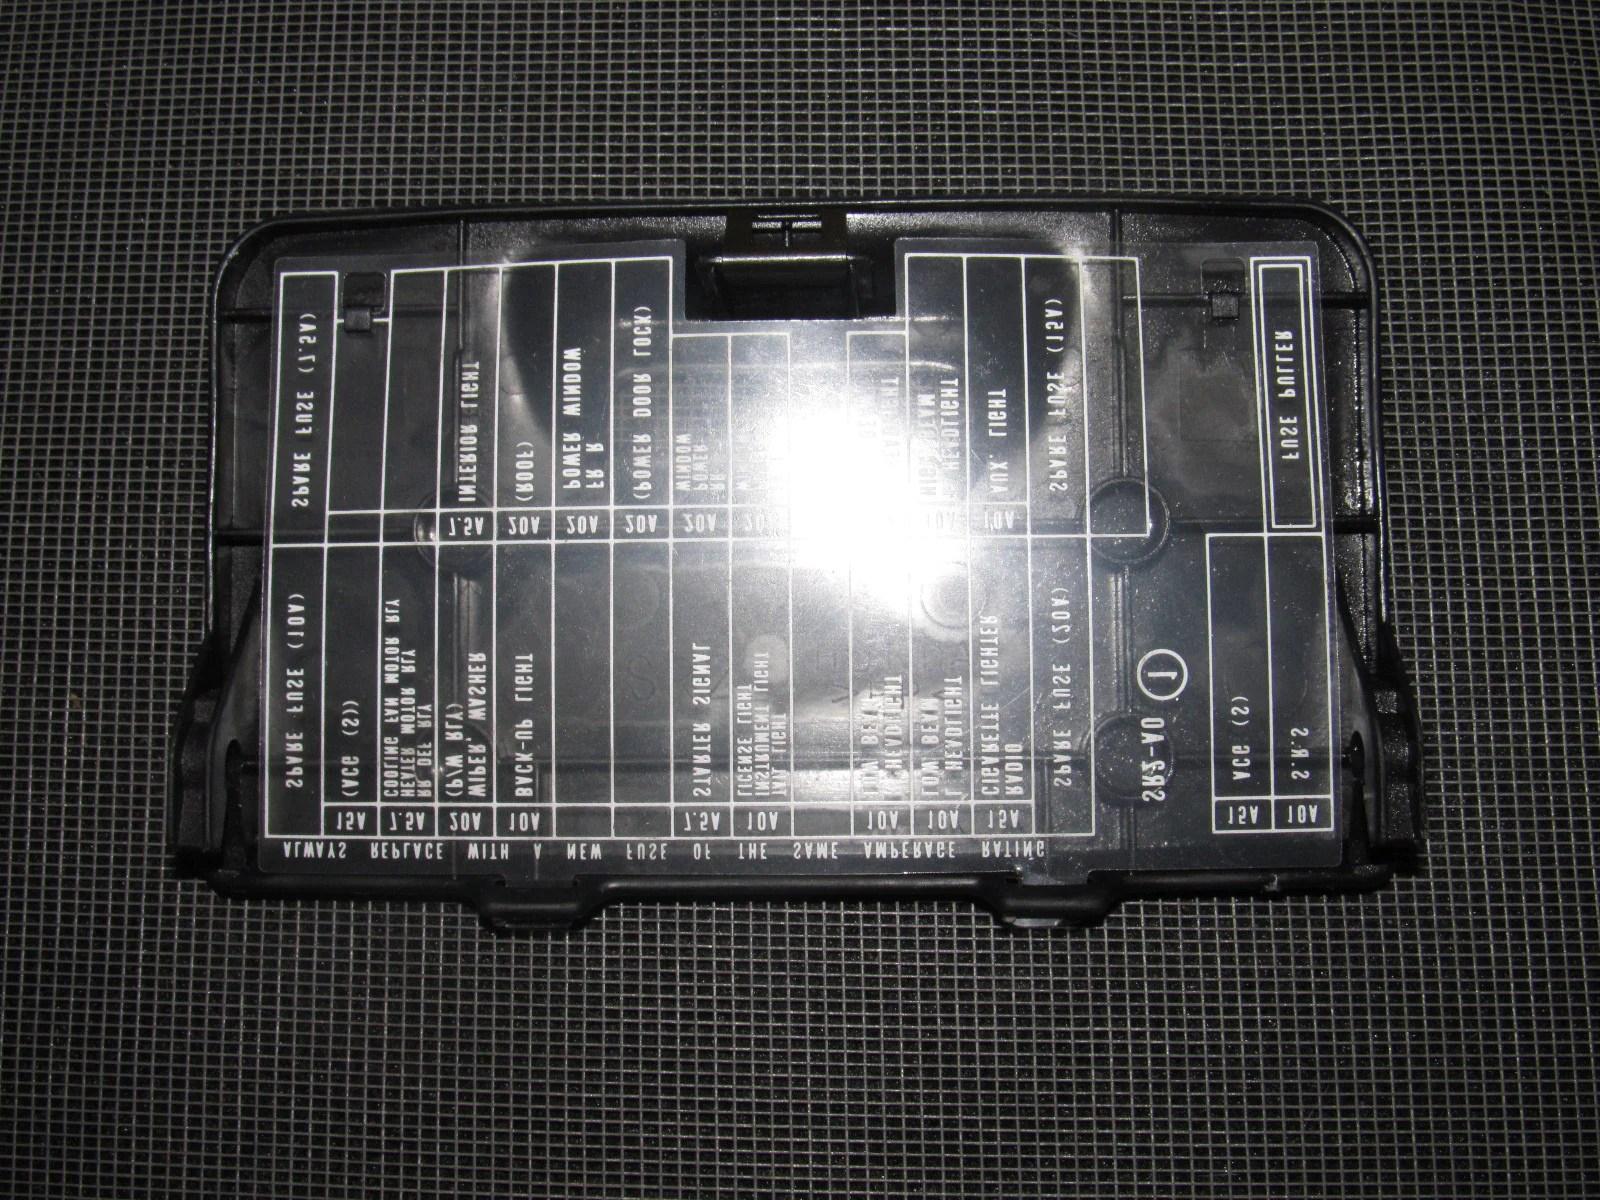 medium resolution of  93 94 95 96 97 honda del sol oem interior fuse box cover